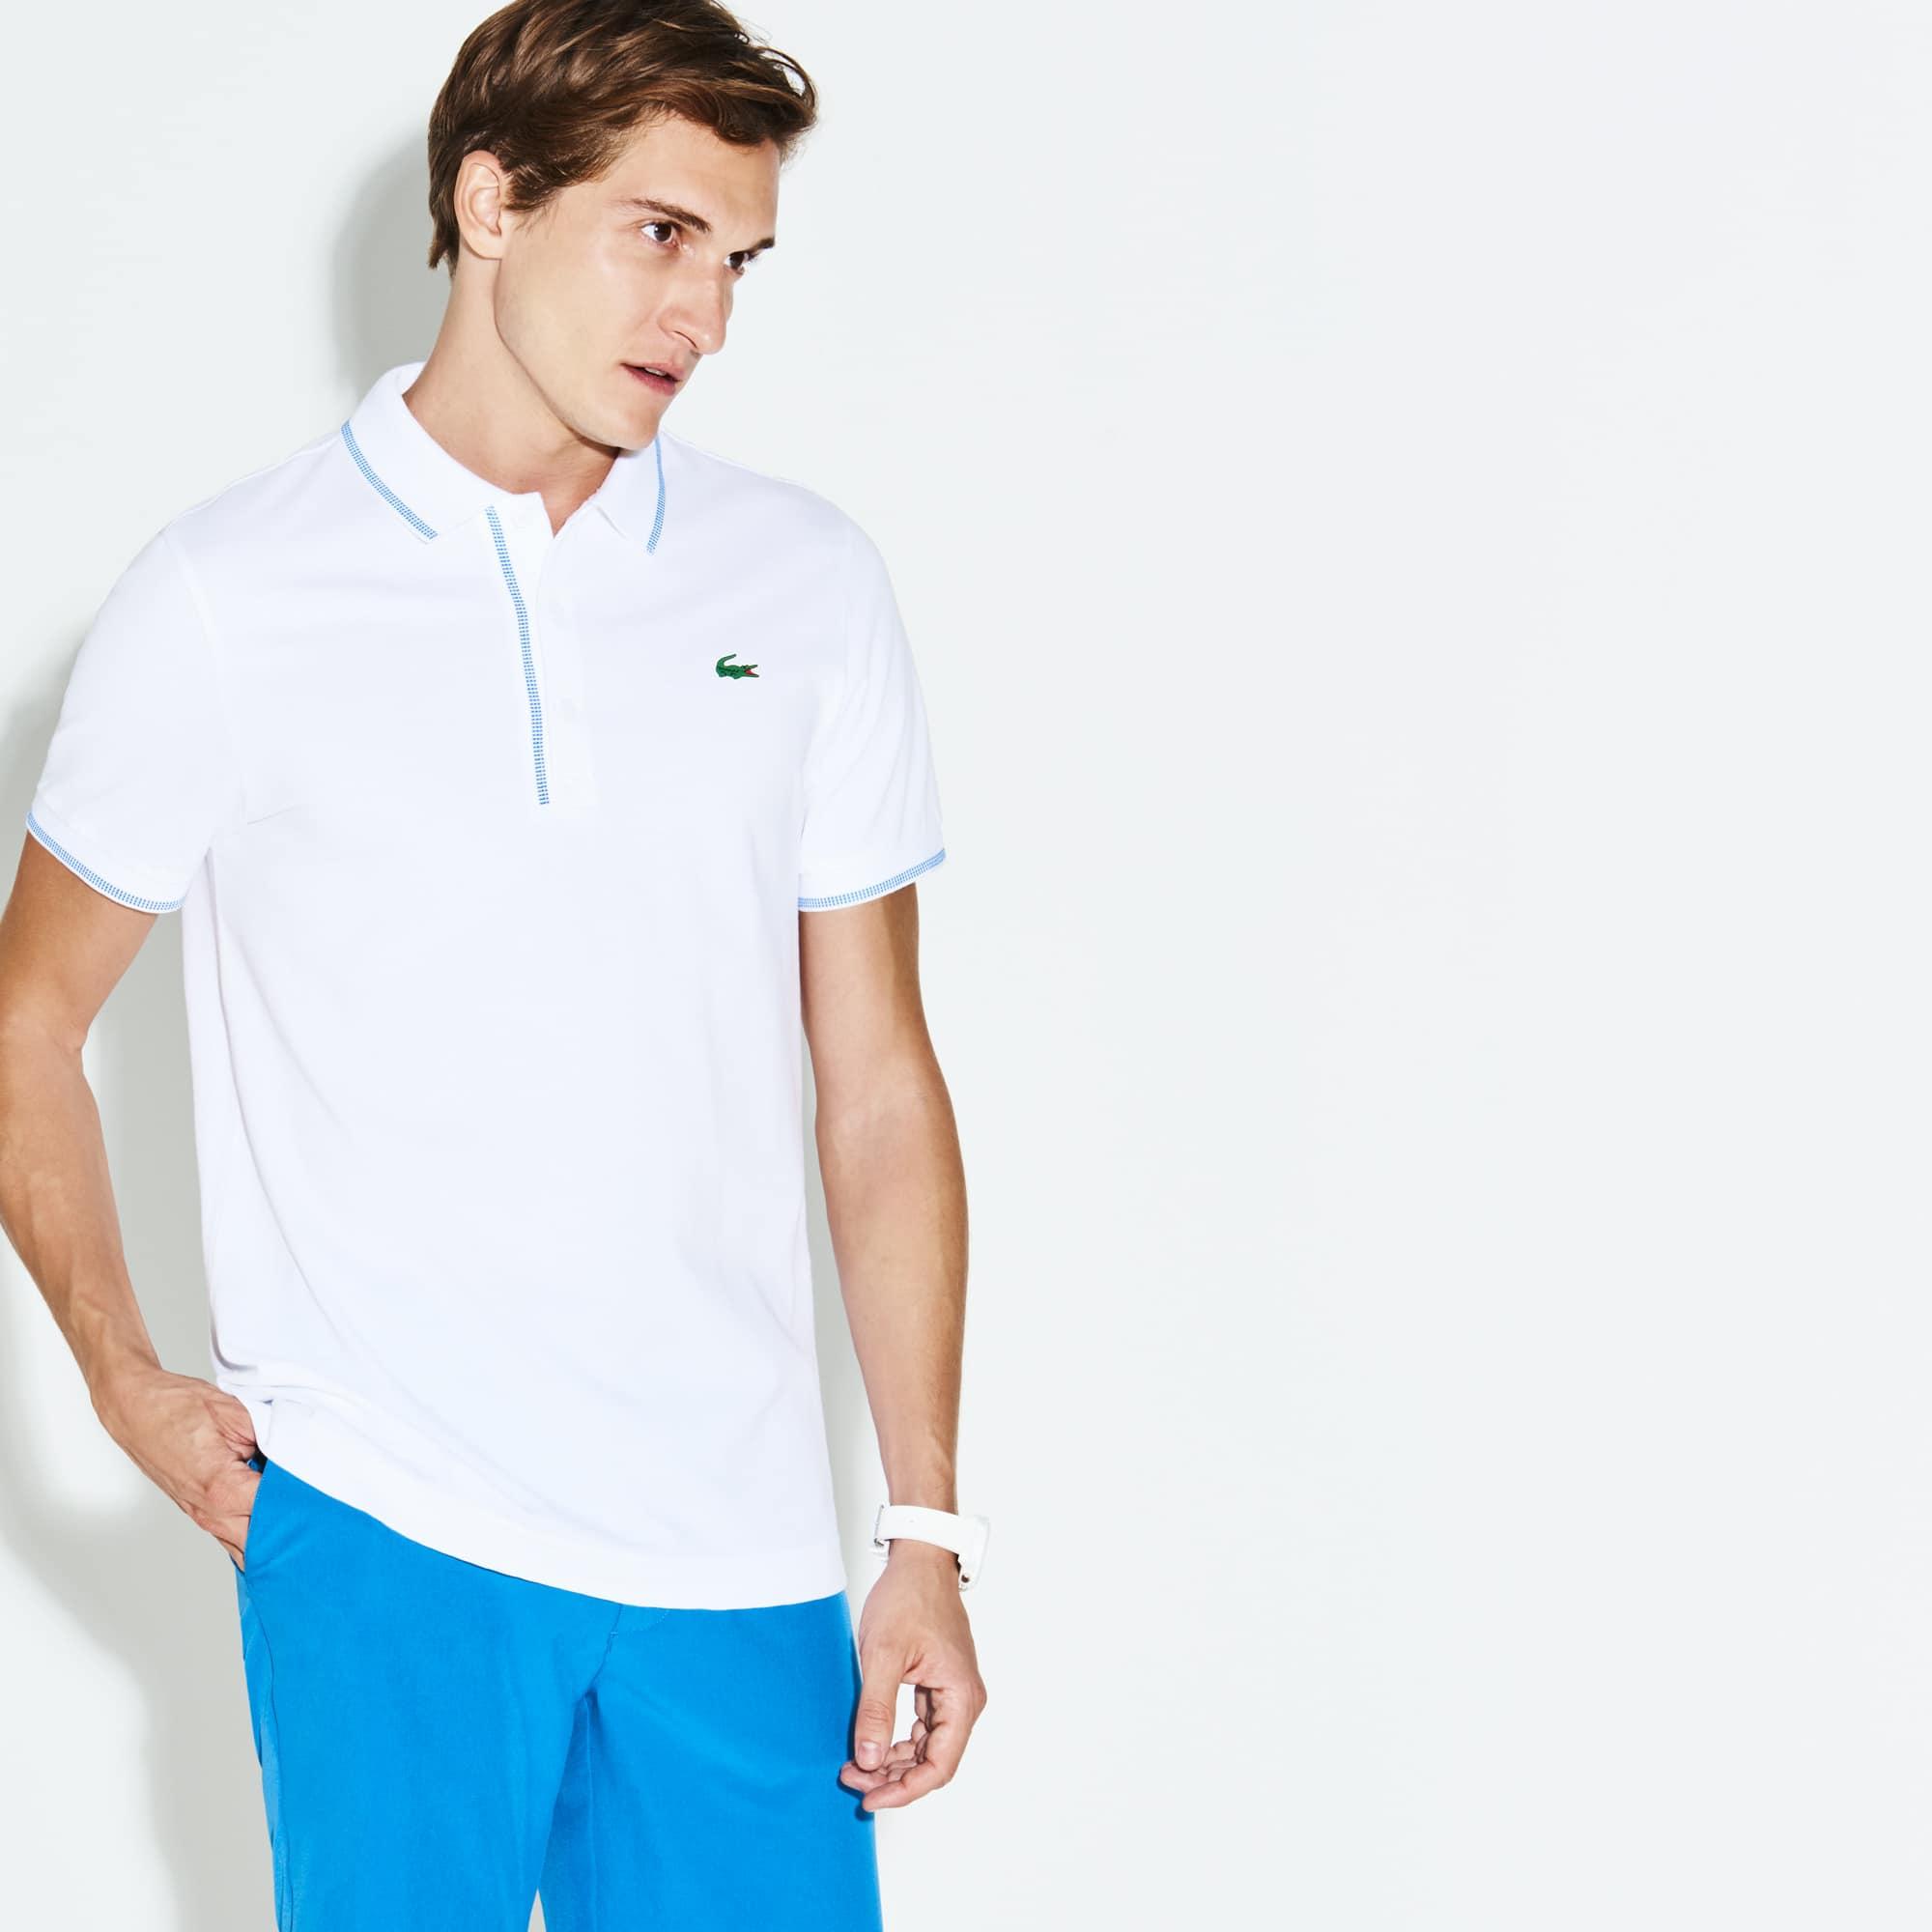 Herren LACOSTE SPORT Golf-Poloshirt mit Paspeln